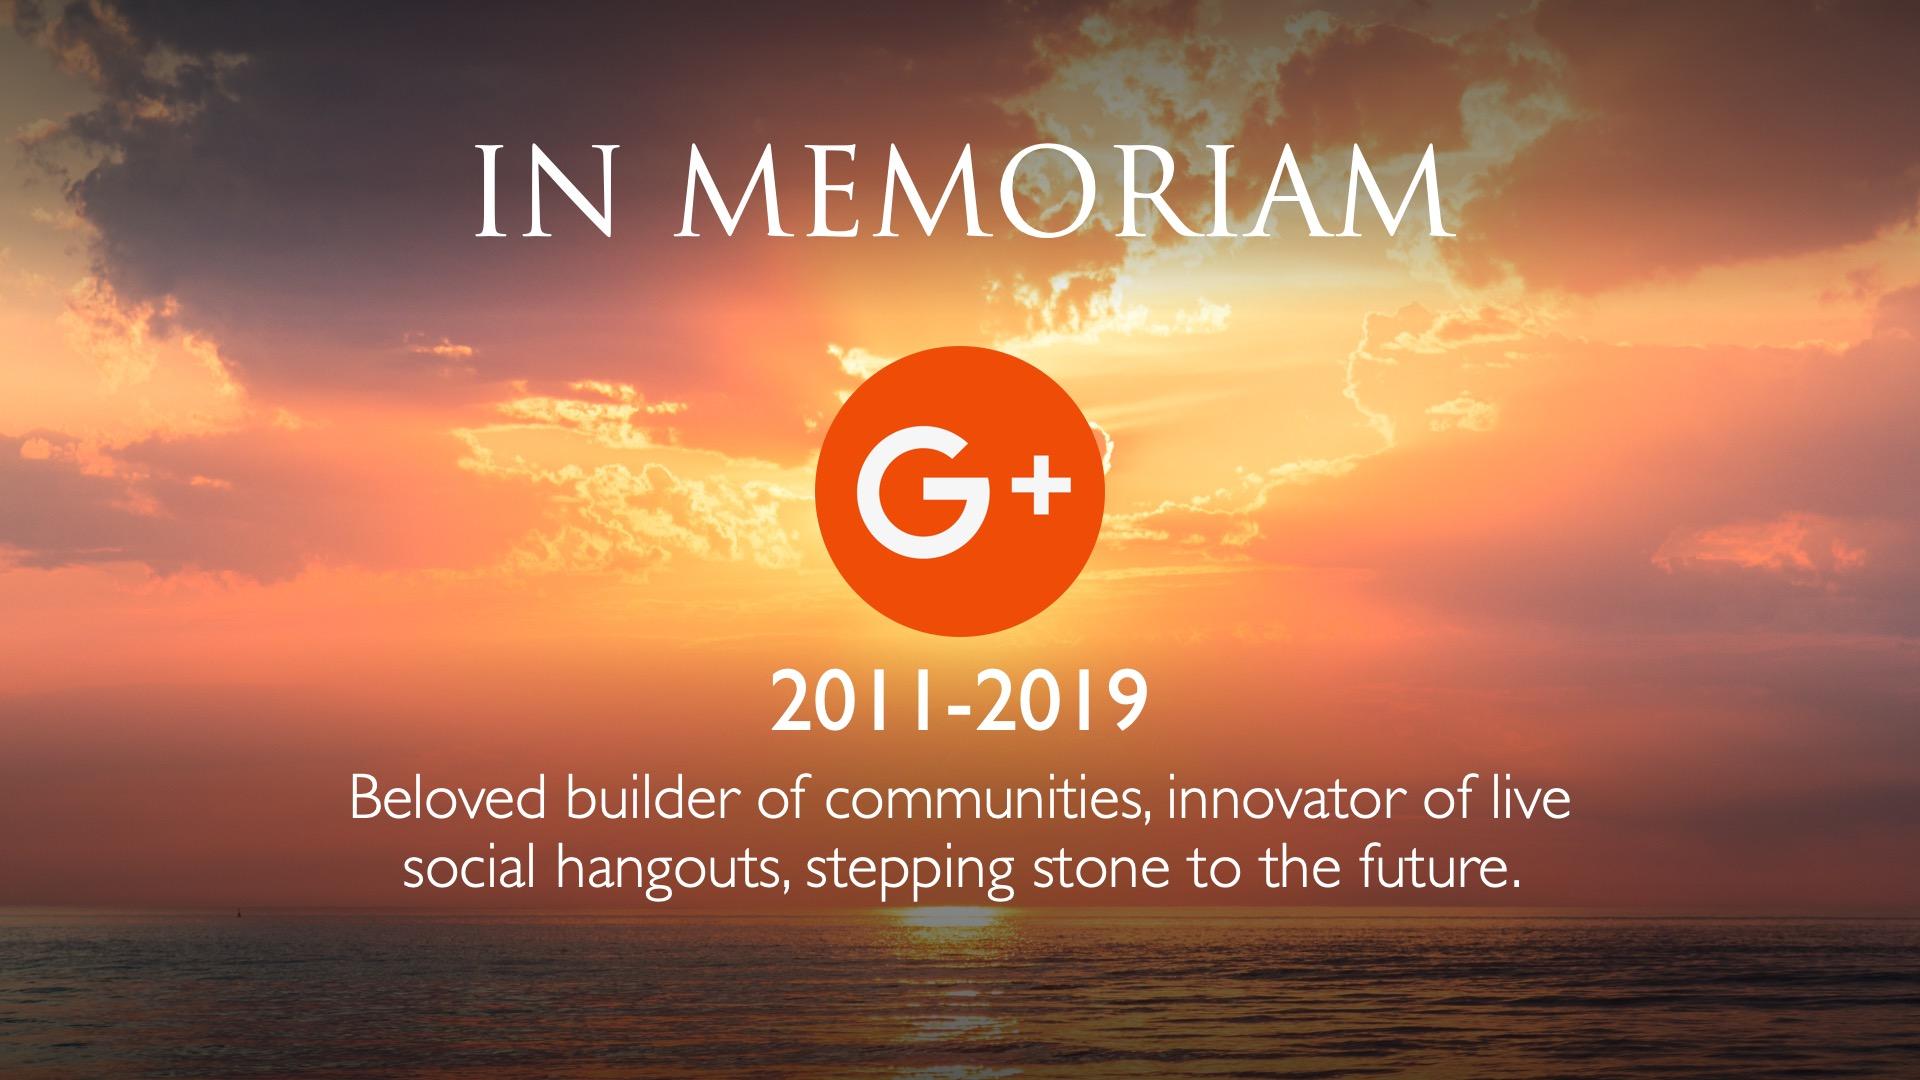 In Memoriam Google+.jpg